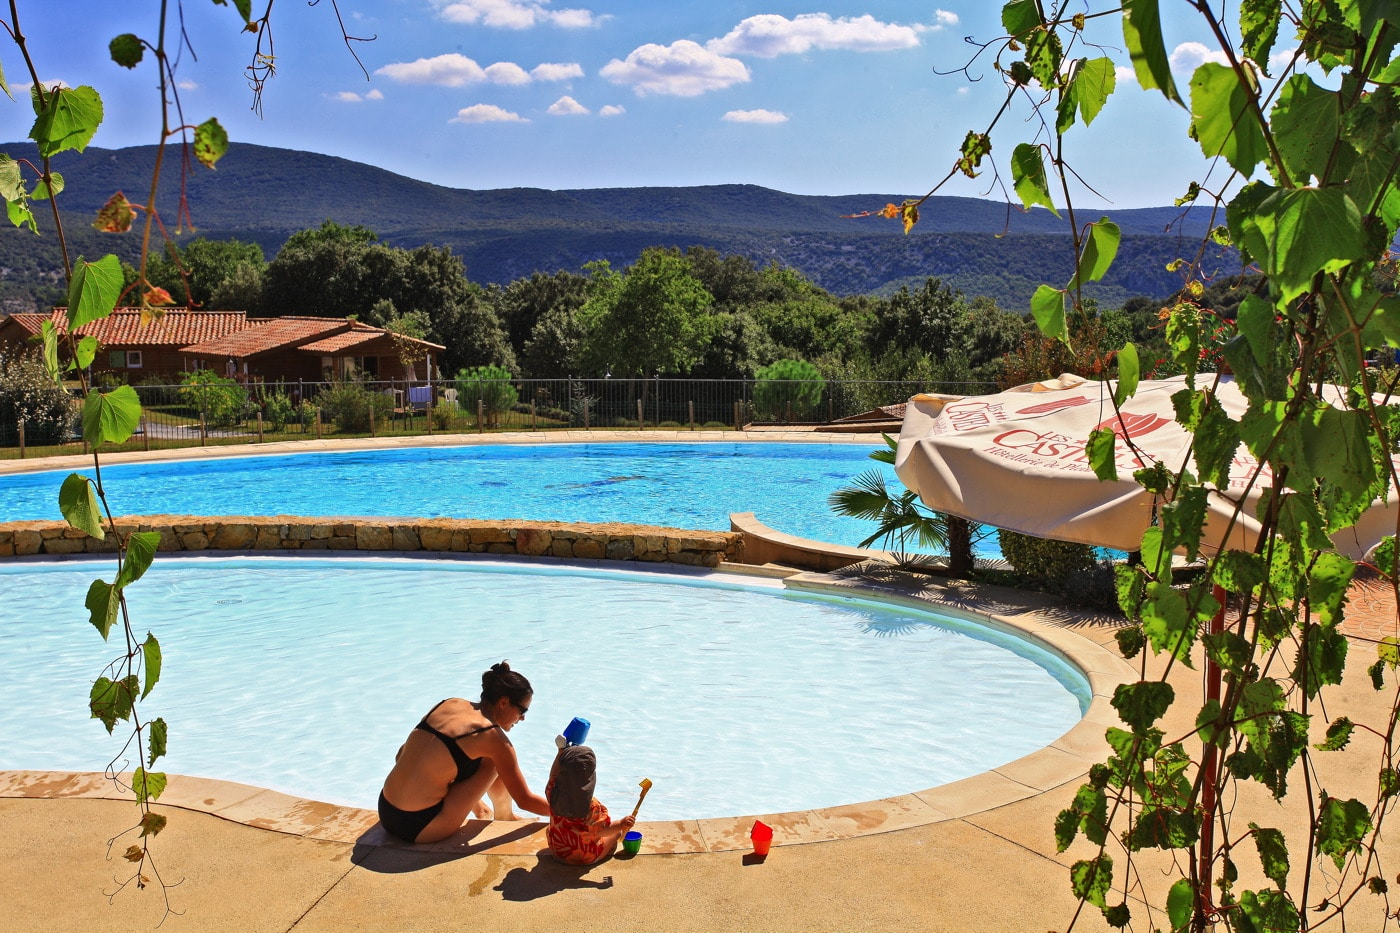 domaine sevenier camping 5 etoiles ardeche piscine galerie photo 14 - domaine-sevenier-camping-5-etoiles-ardeche-piscine-galerie-photo-14